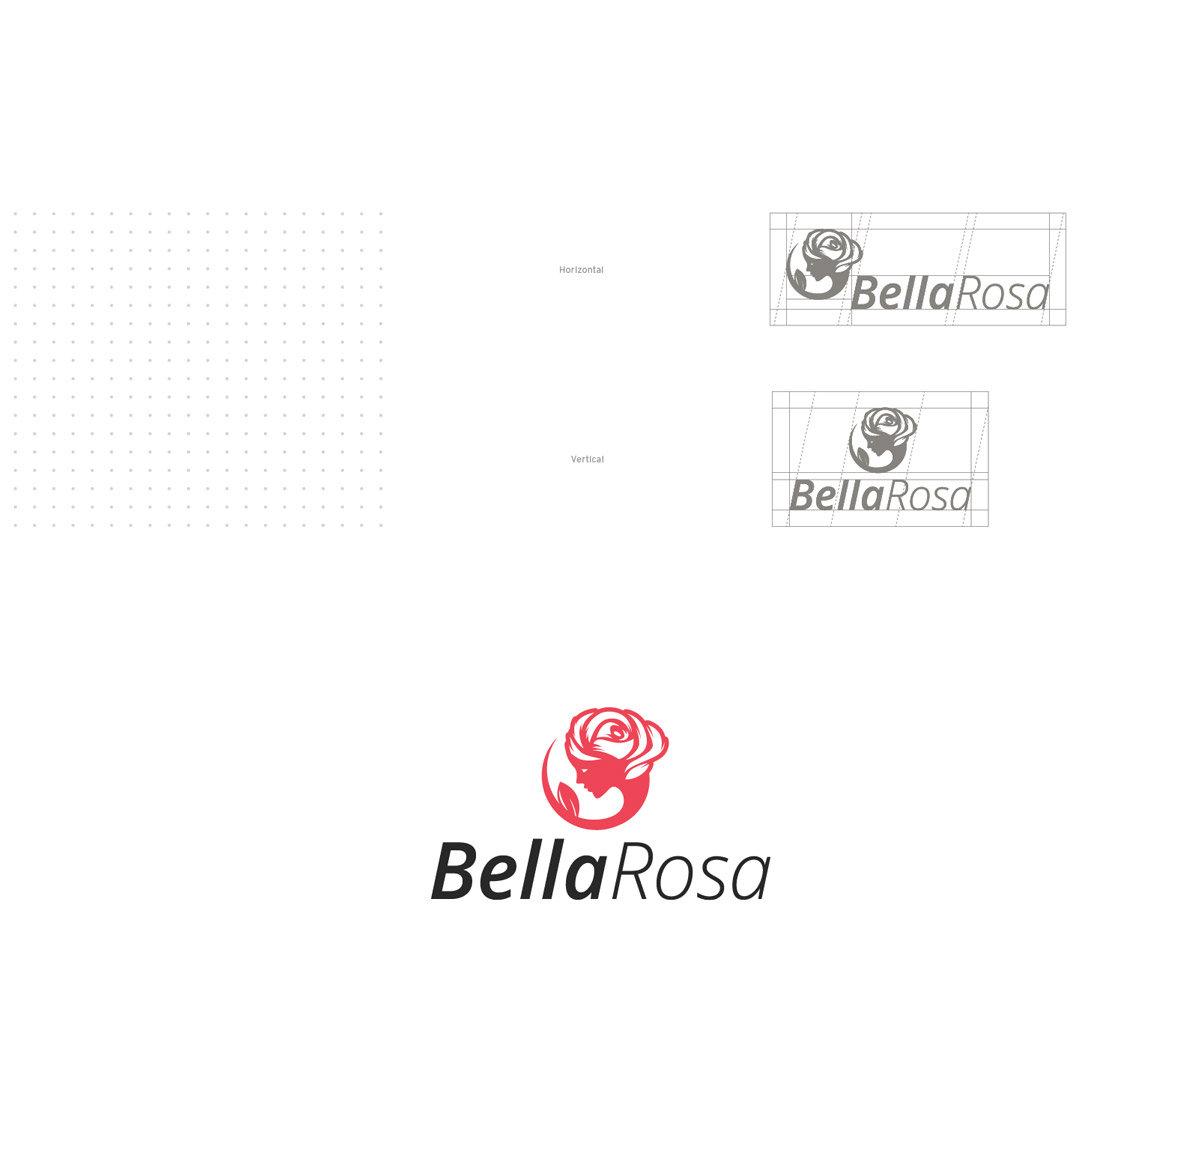 Bella Rosa logotipo